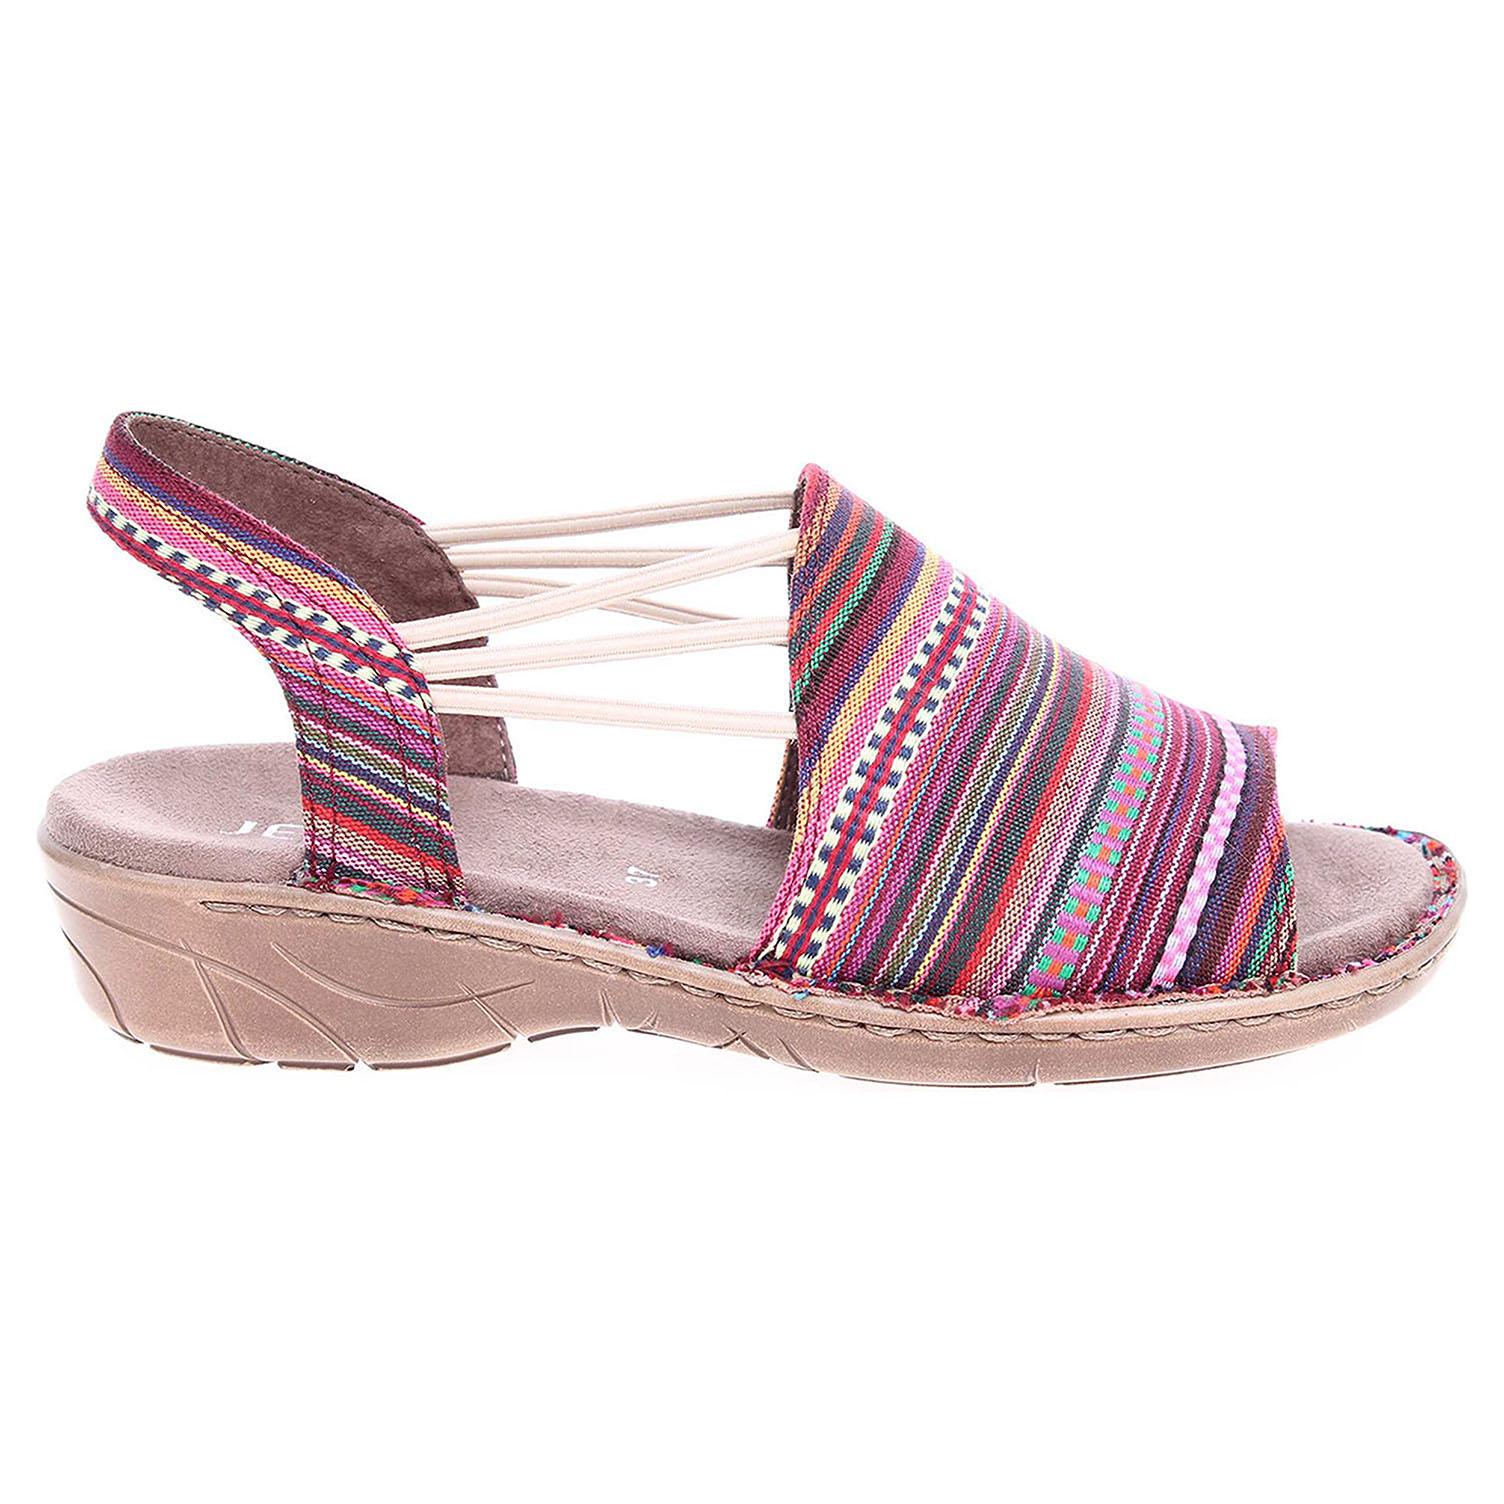 Ecco Ara dámské sandály 57283-79 multi 23801142